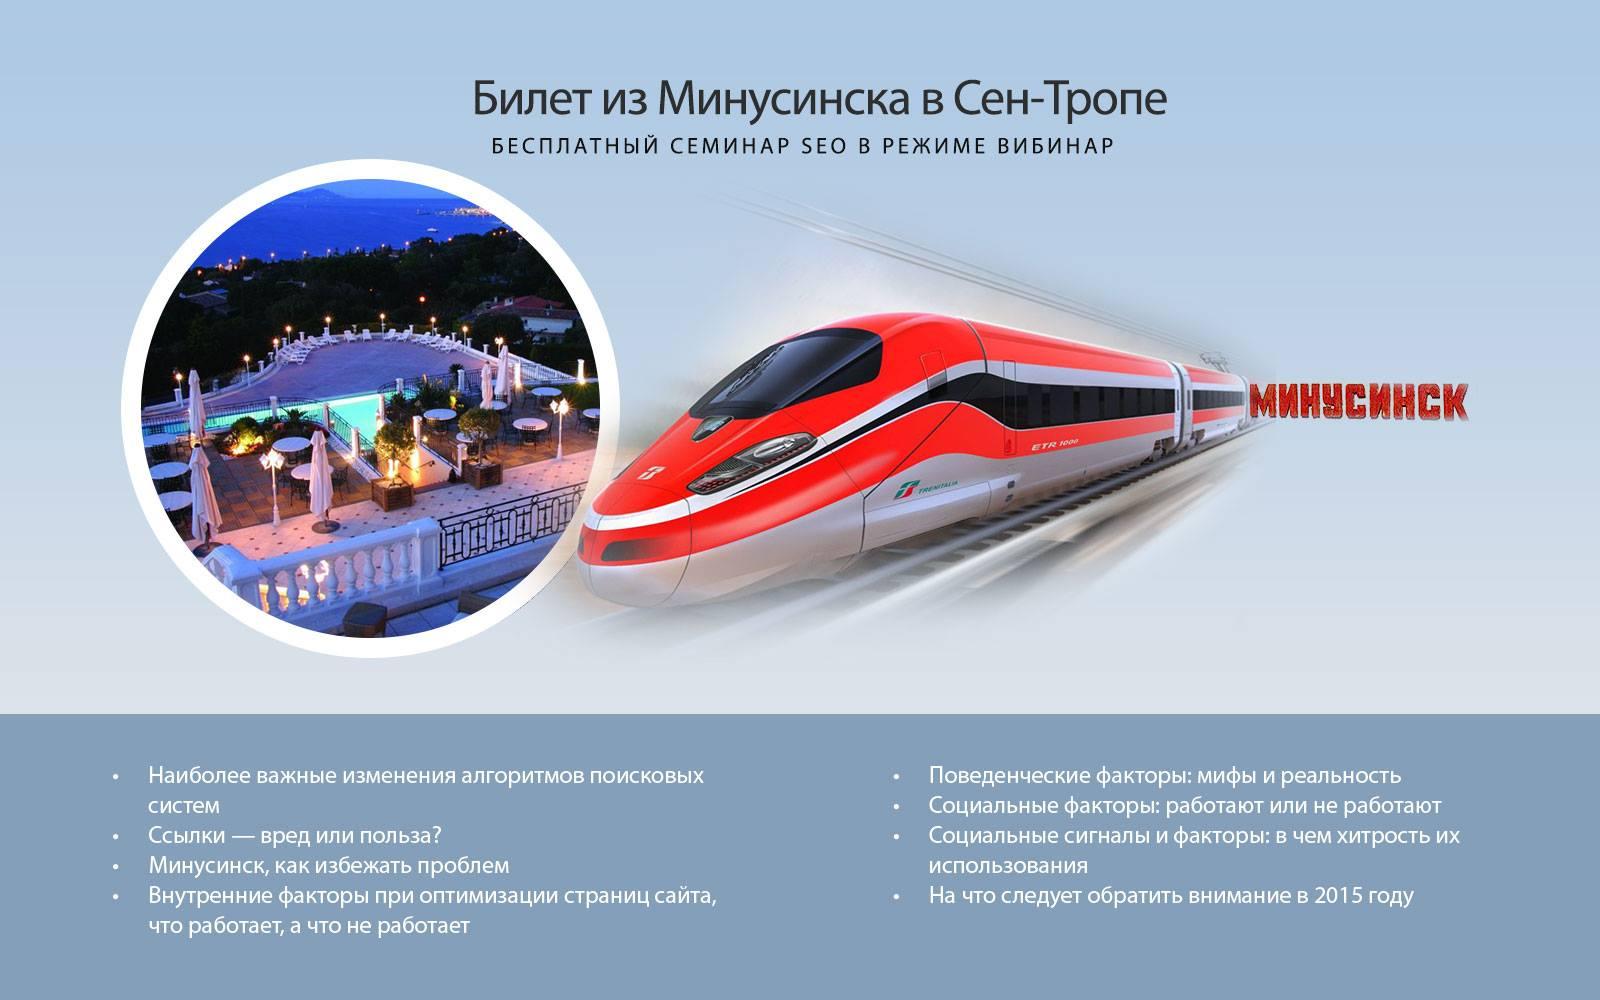 Билет из Минусинска в Сен-Тропе бесплатно